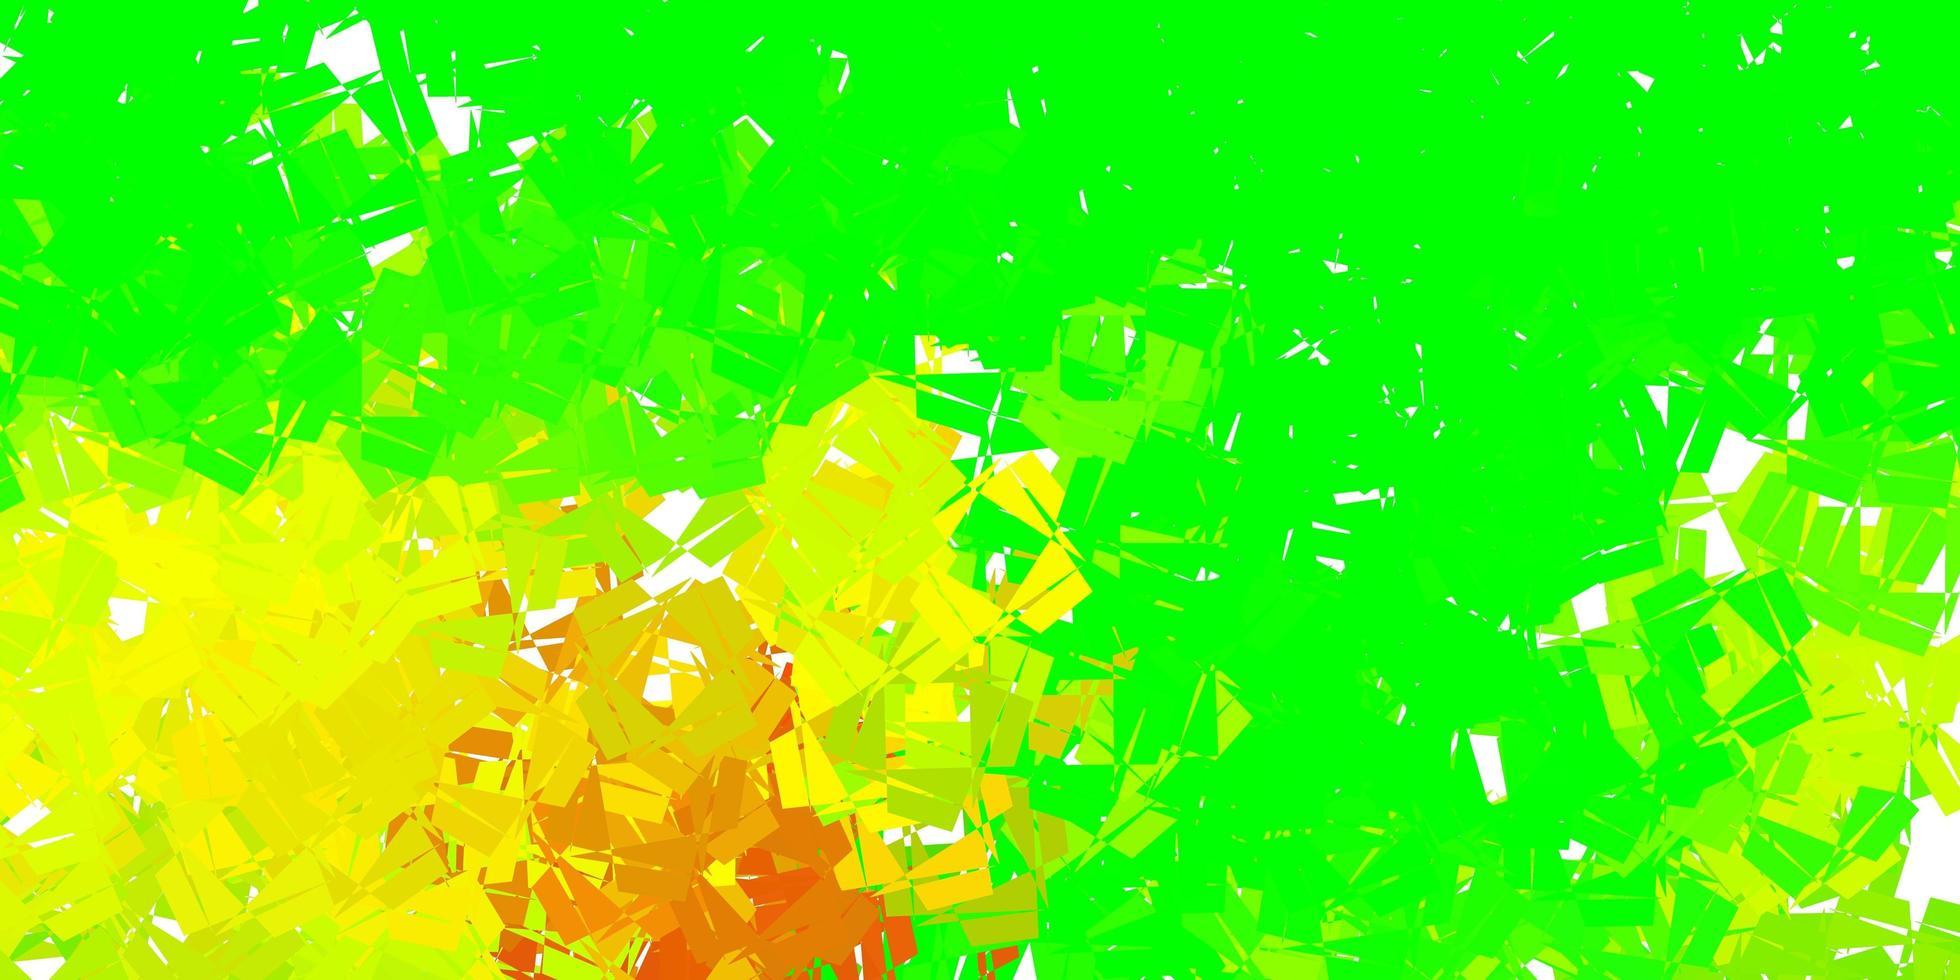 dunkle mehrfarbige Vektor-Gradienten-Polygon-Tapete. vektor